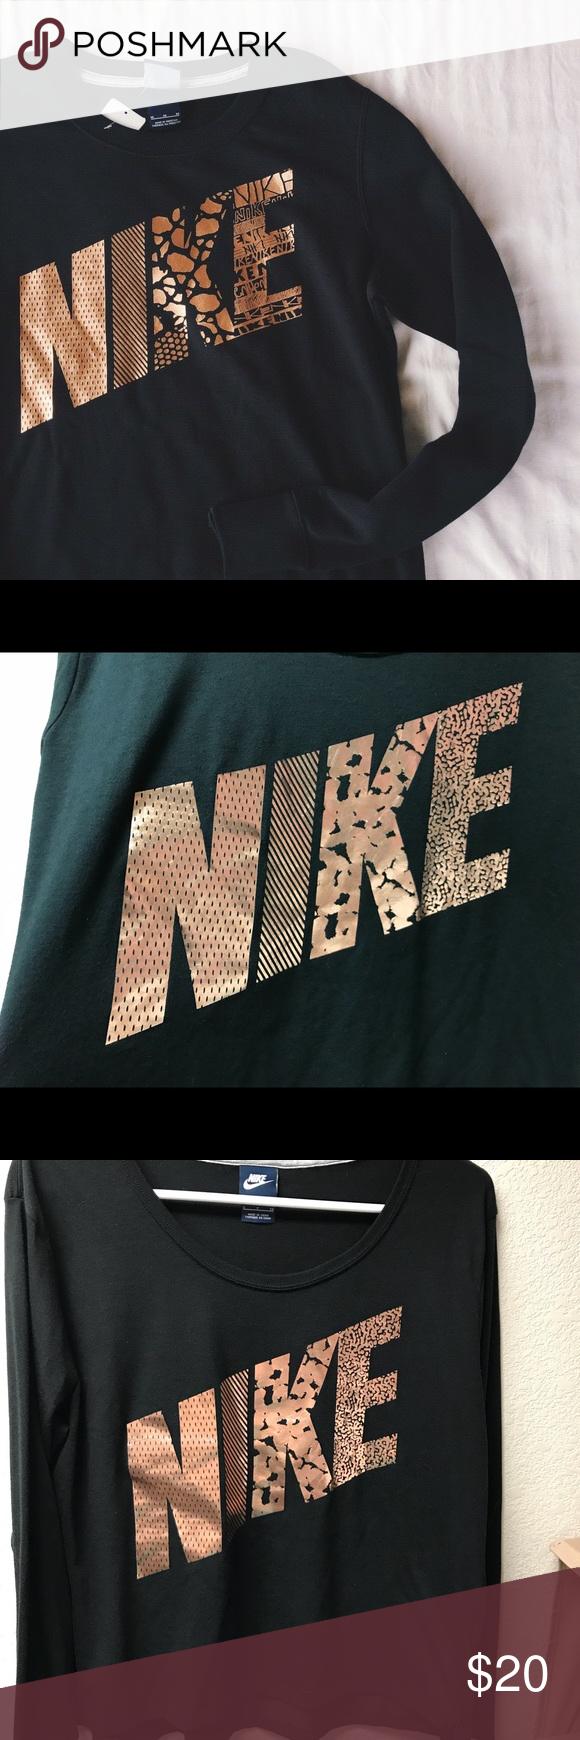 2fdd369625bc Nike Rose Gold Print Long Sleeve Top. Small Nike Rose Gold Print Long Sleeve  Top. Small. EUC. Nike Tops Tees - Long Sleeve